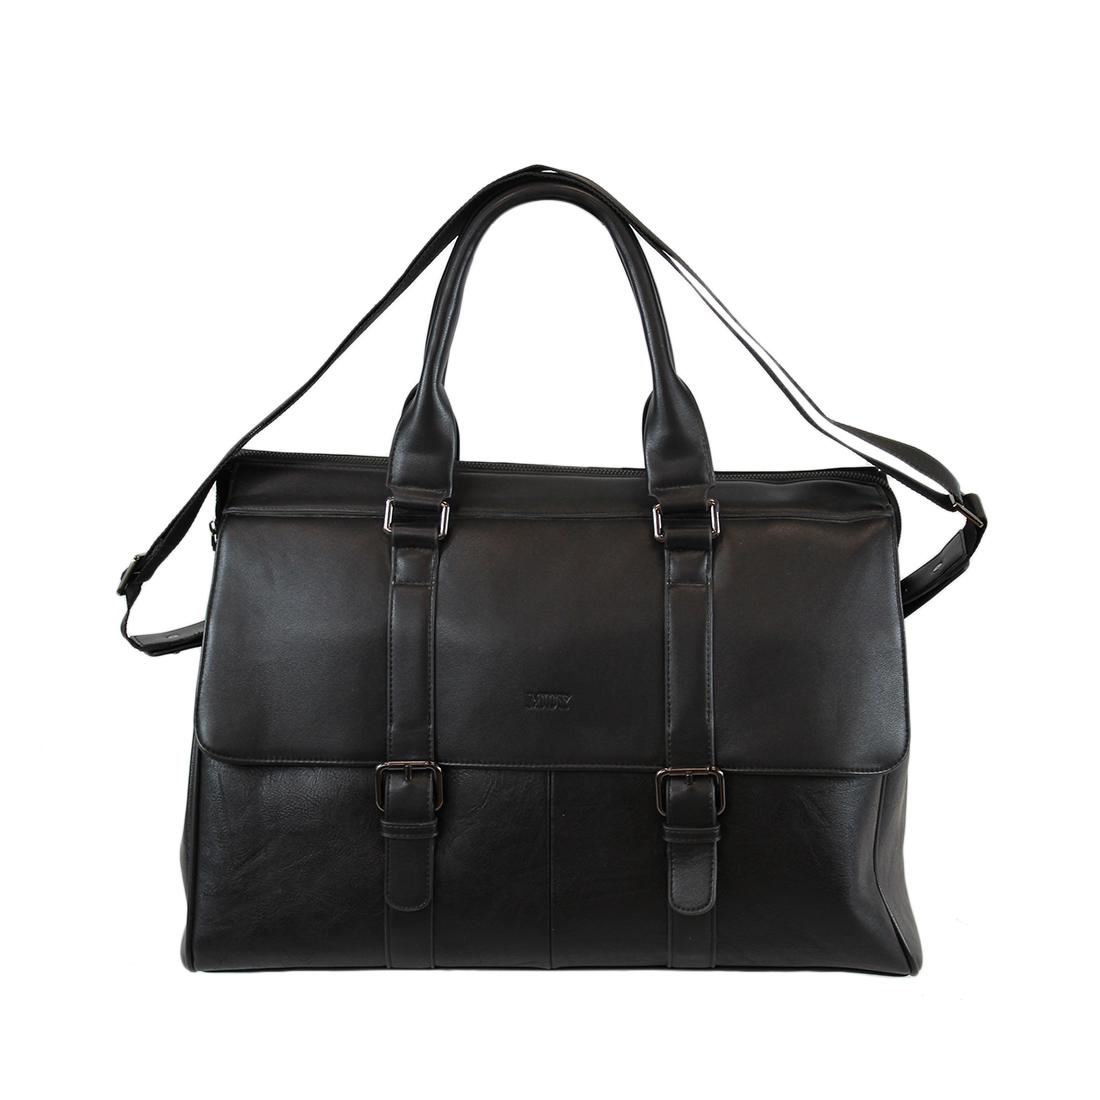 Real Leather - Big travel bag